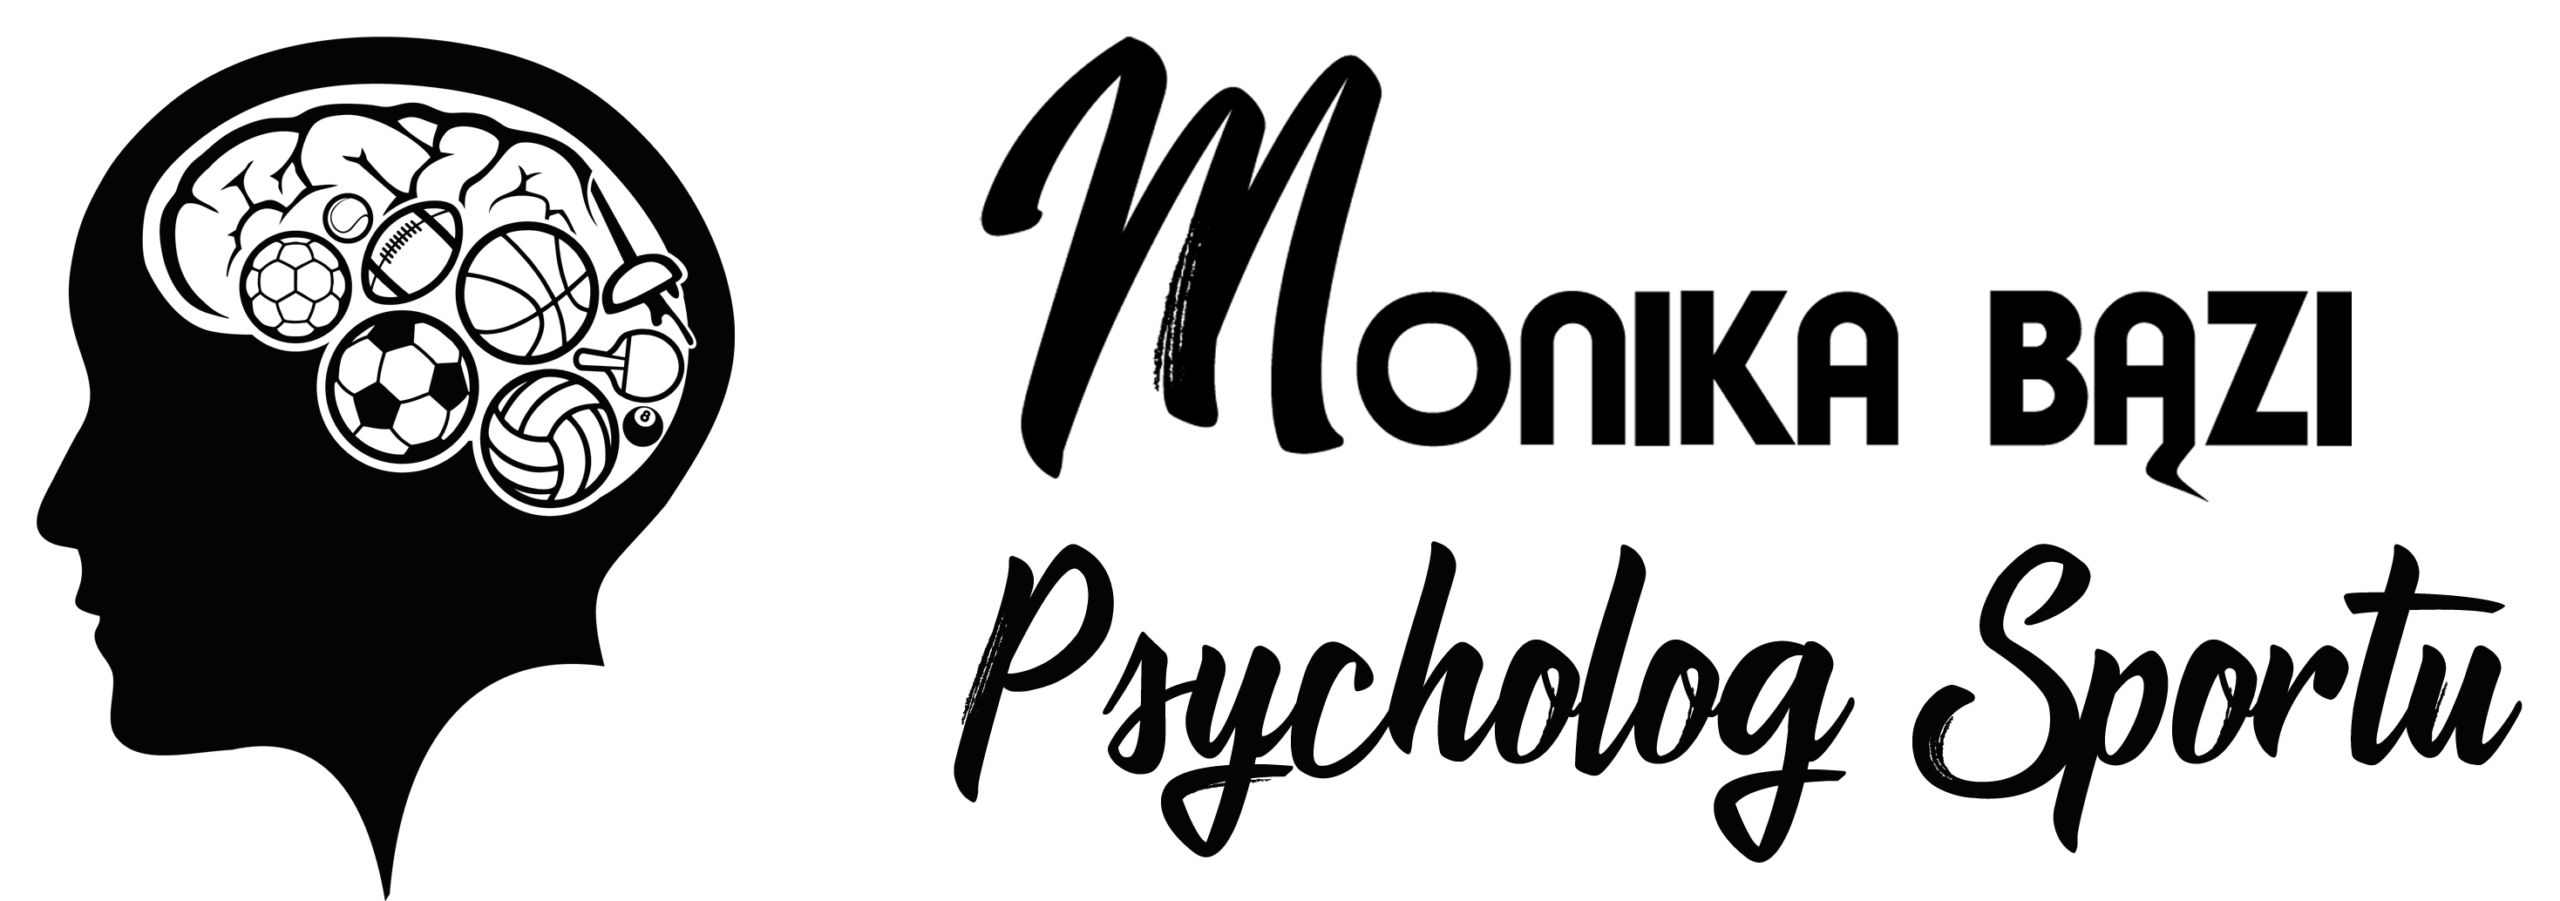 Psycholog Sportu Monika Bązi